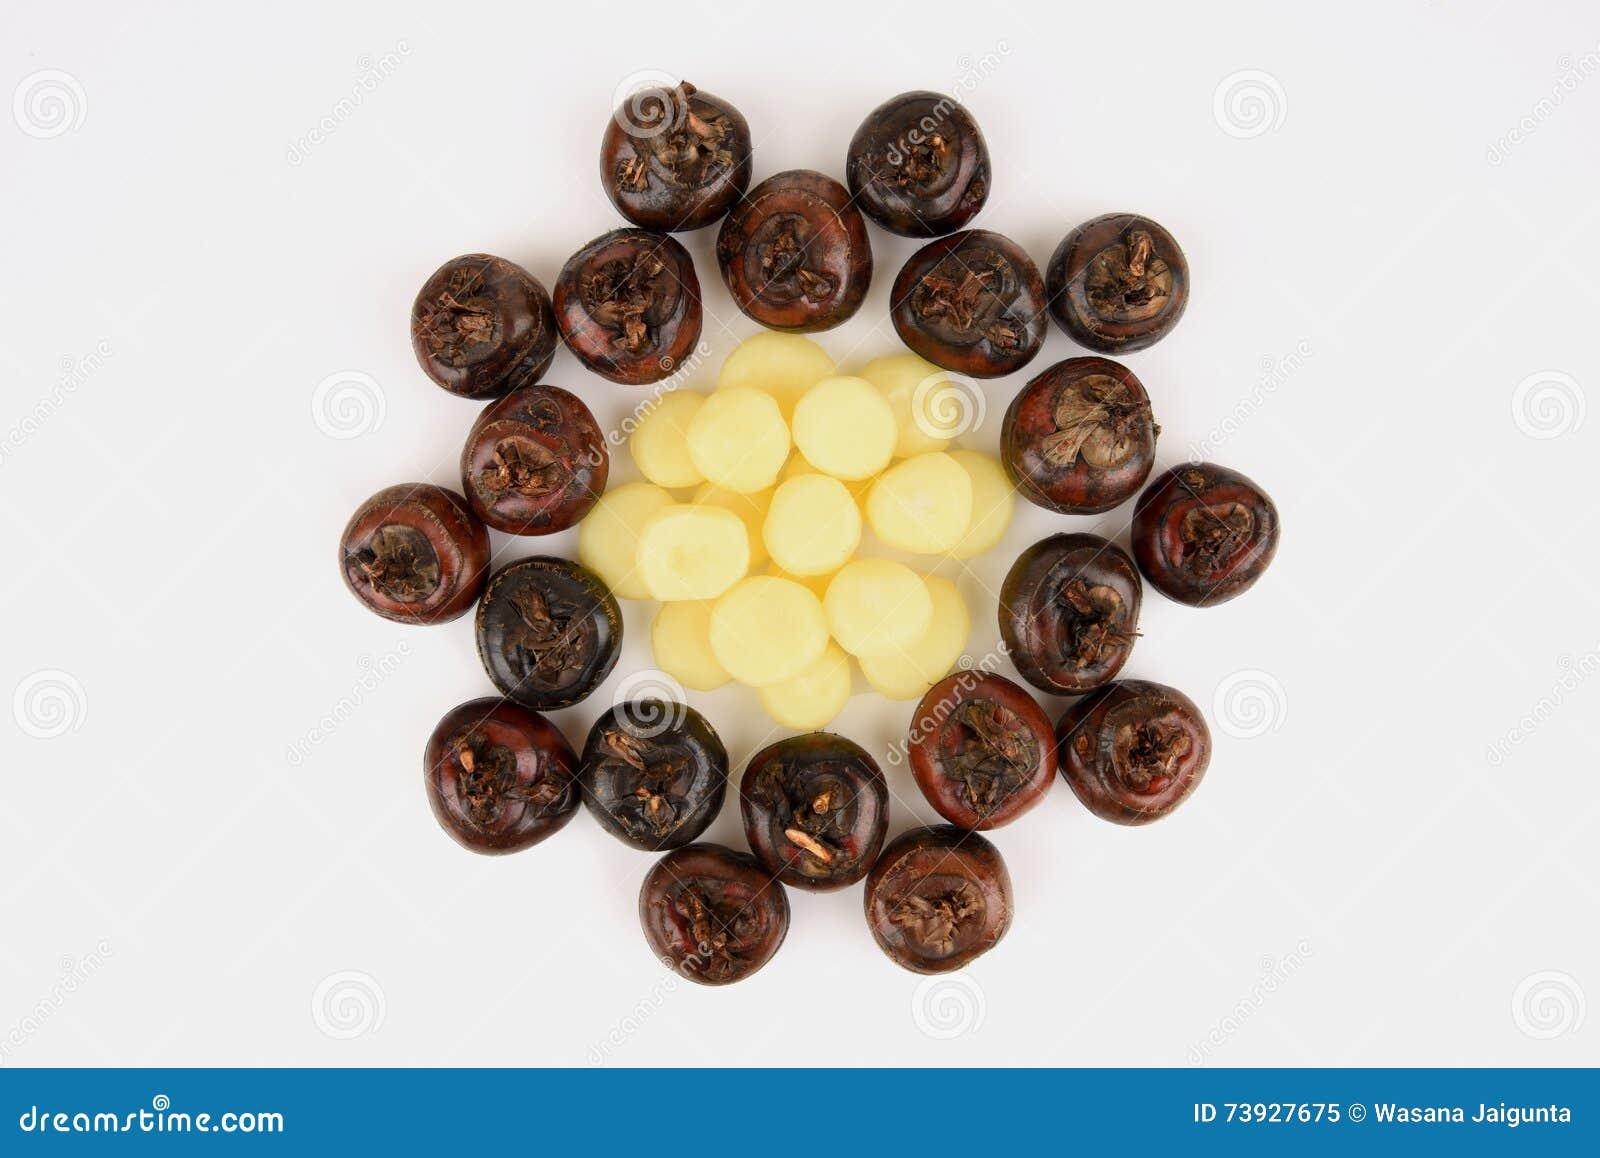 Ground Chesnut, Chinese Water Chestnuts: Fruit Native Of